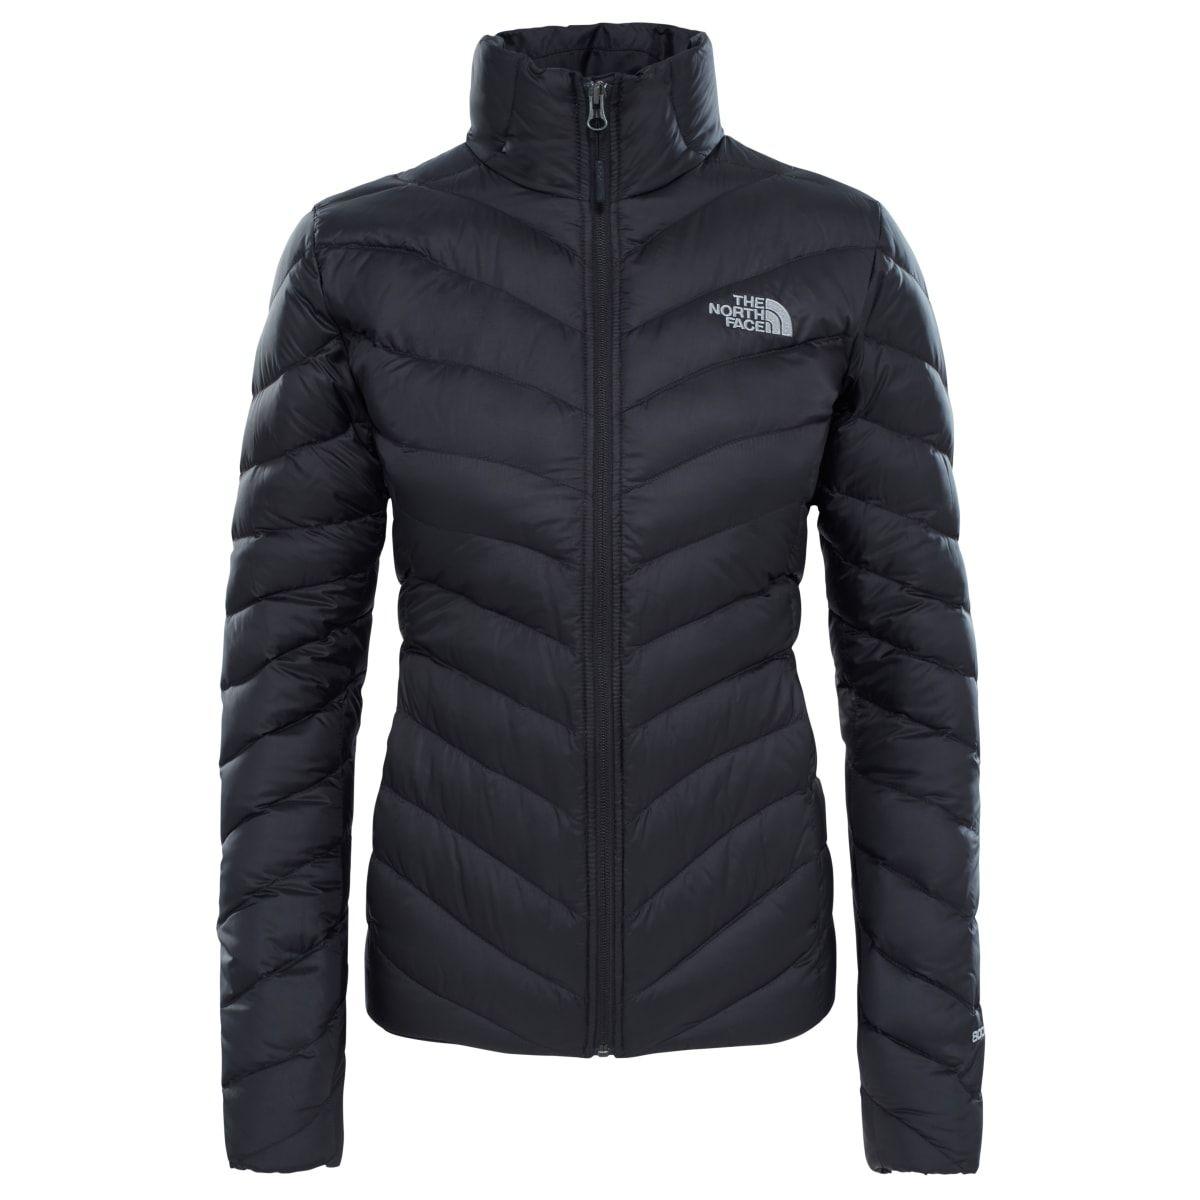 a5fc574cf Køb The North Face Women's Trevail Jacket fra Outnorth | ønsker ...